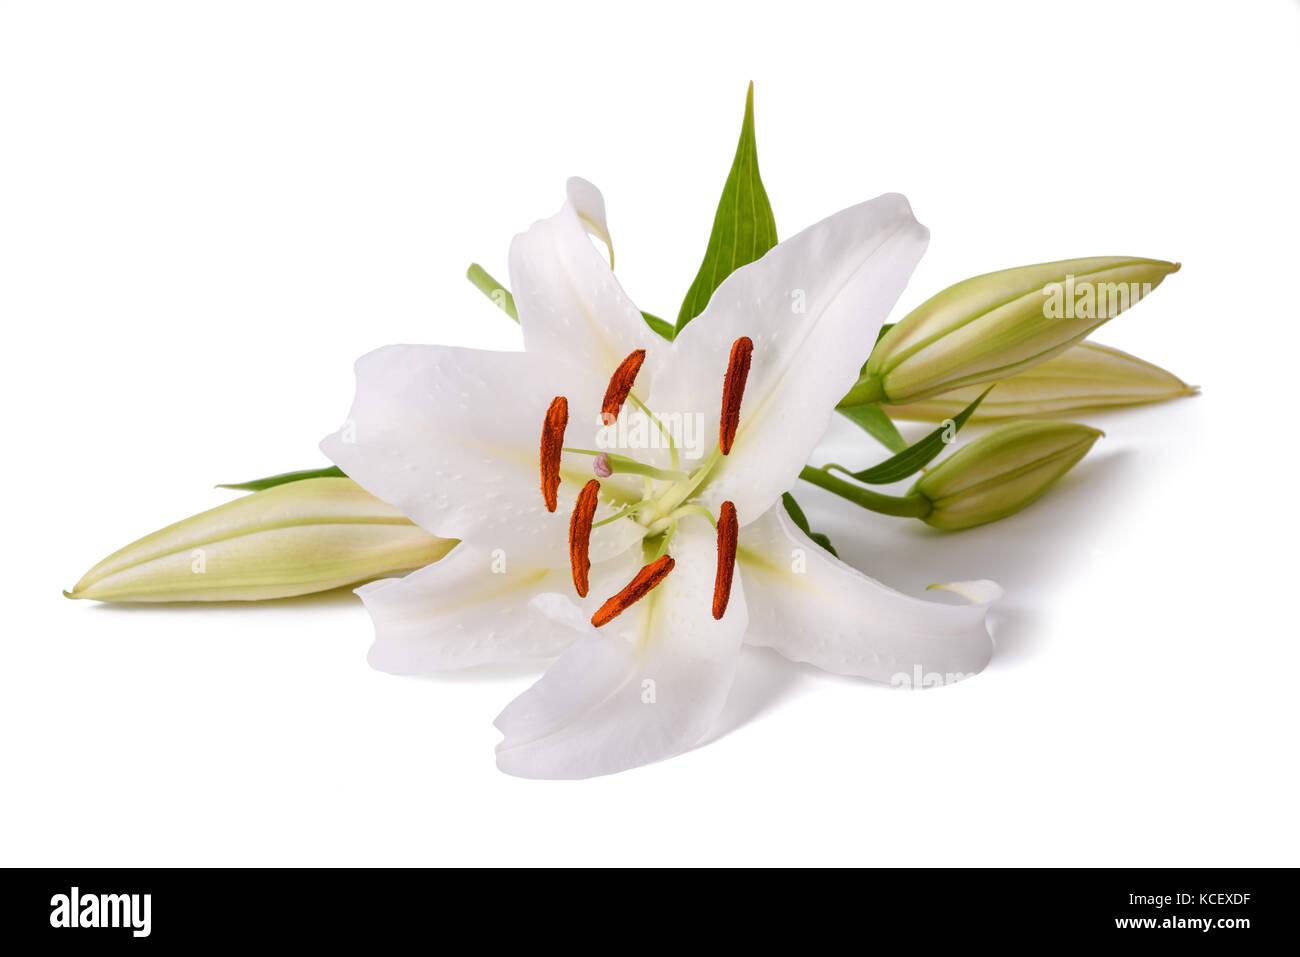 White madonna lily lilium candidum stock photos white madonna lily white lily flower isolated on a white background stock image izmirmasajfo